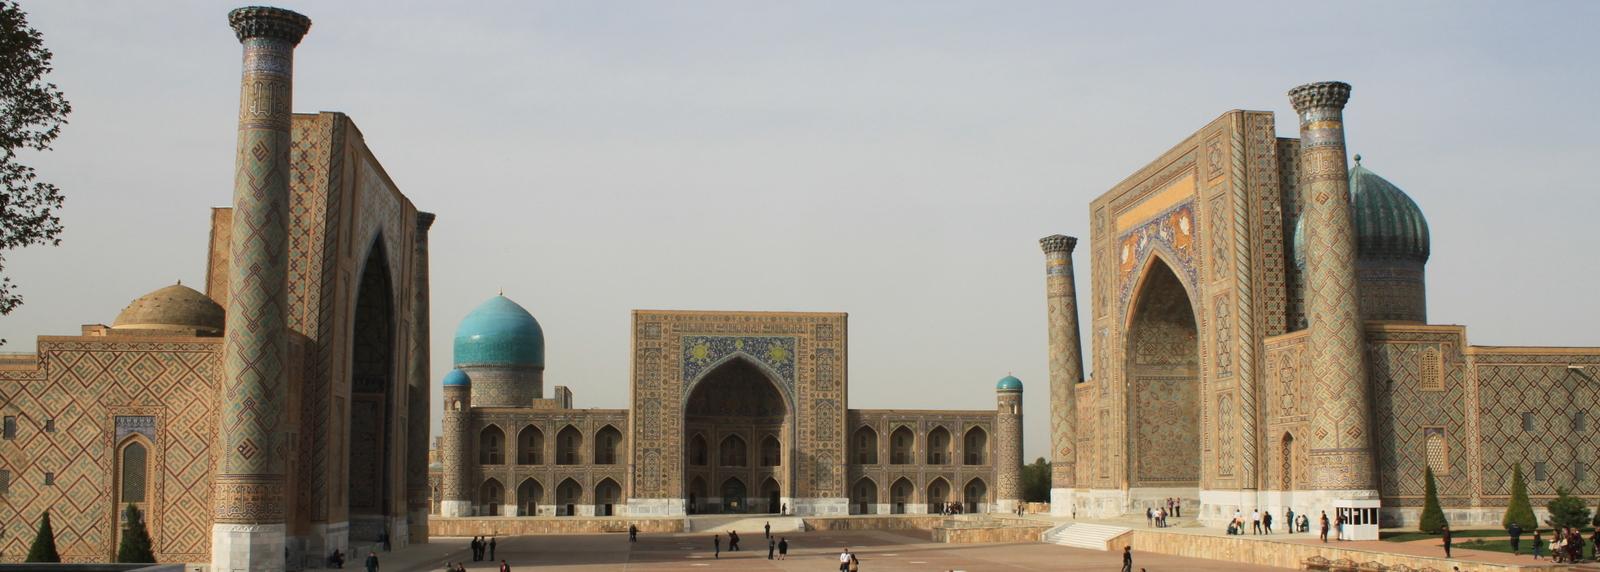 Registan Samarkand, Oezbekistan